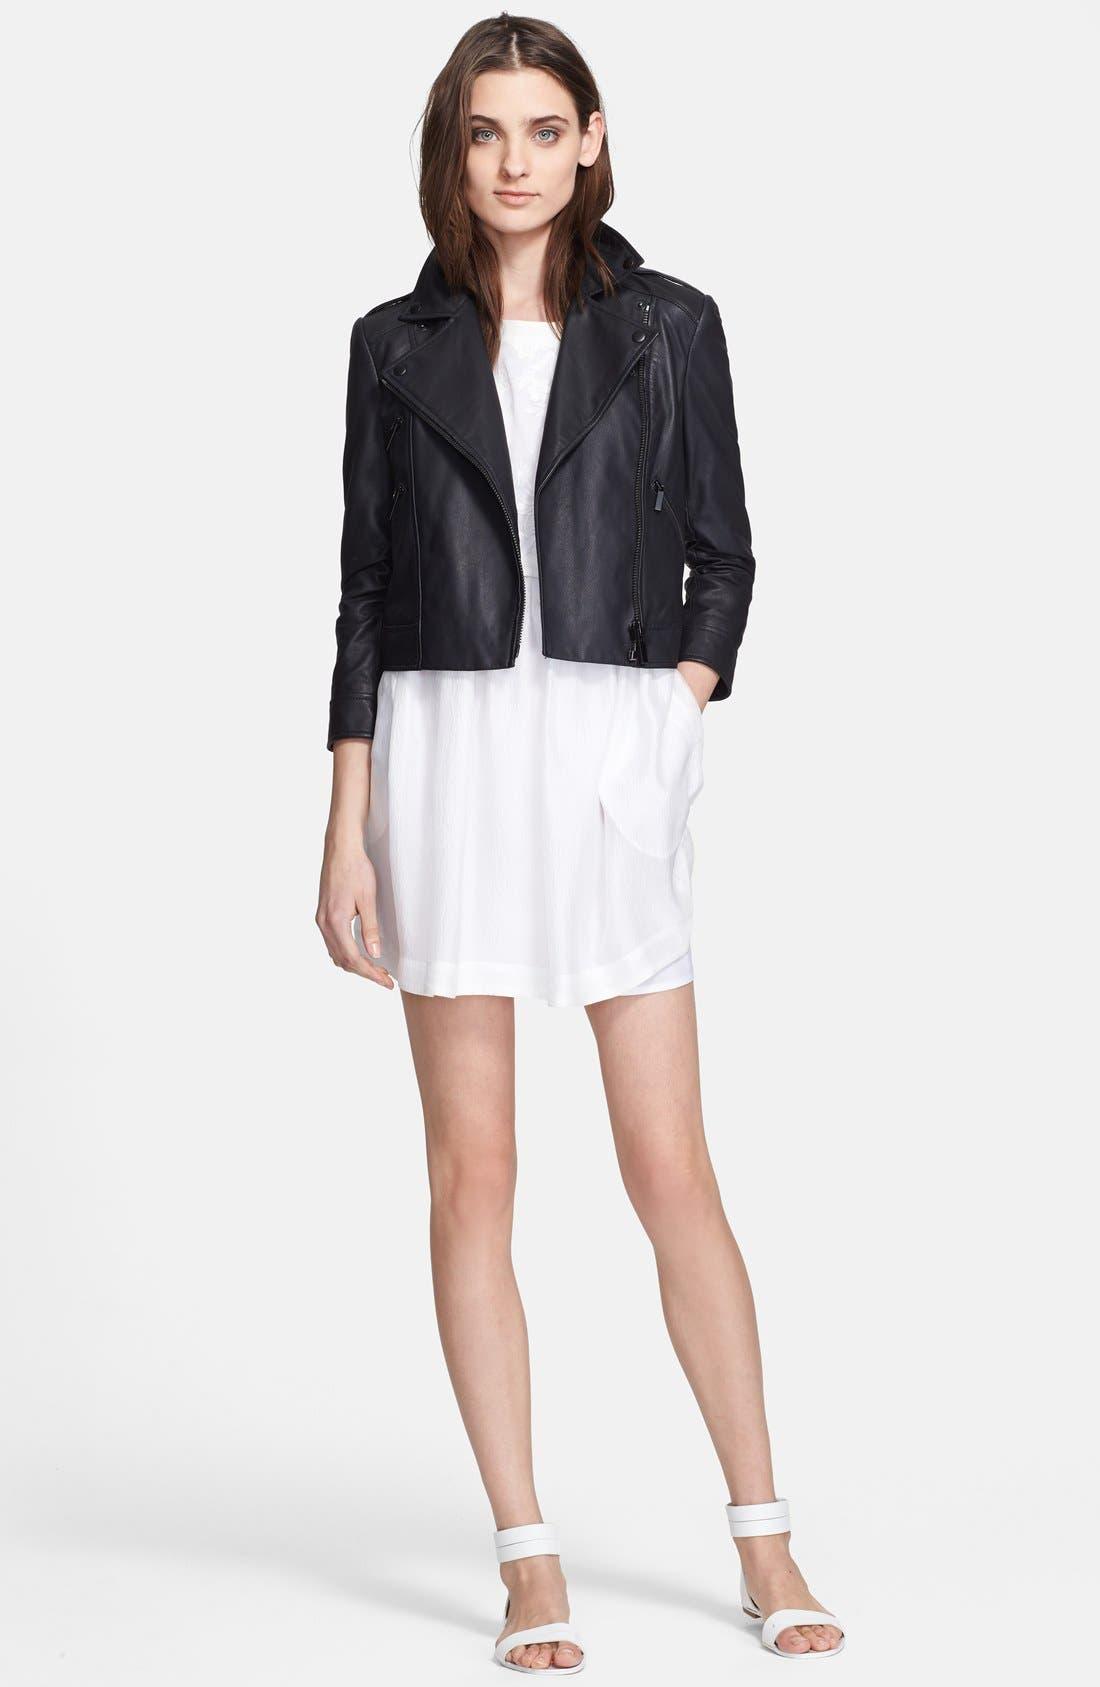 Alternate Image 1 Selected - Elizabeth and James 'Erwan' Leather Jacket